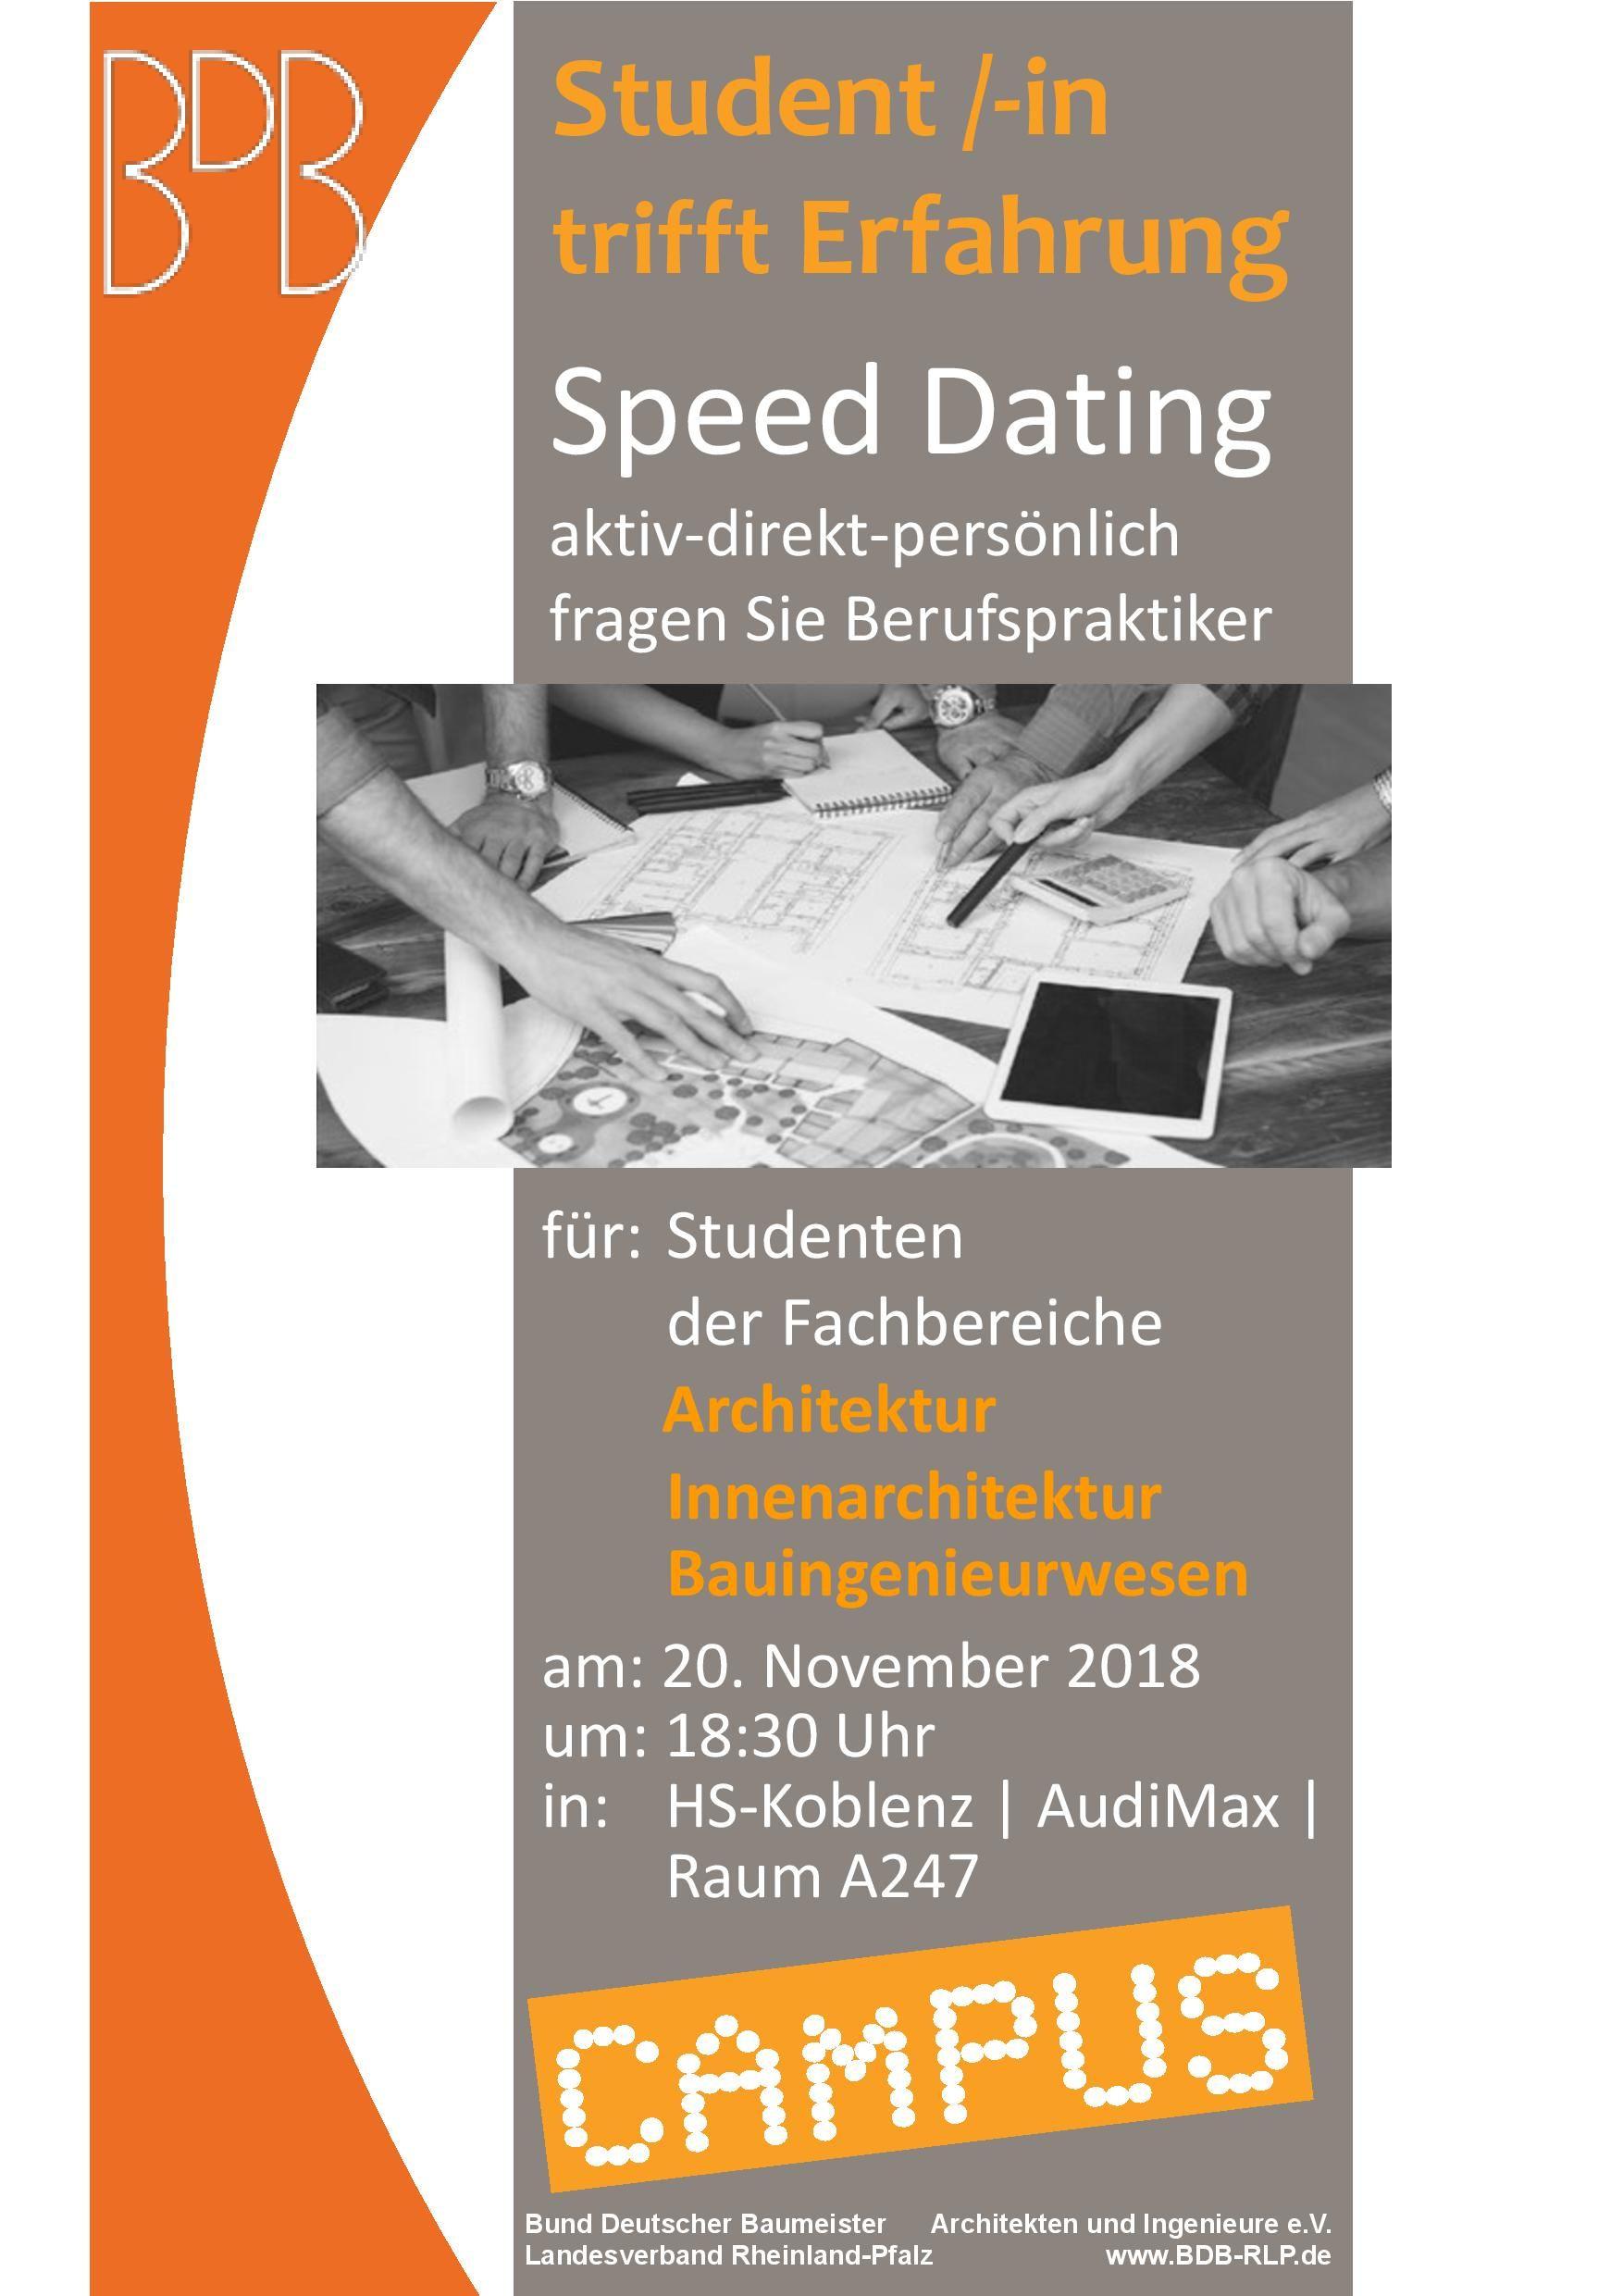 fonejacker online dating